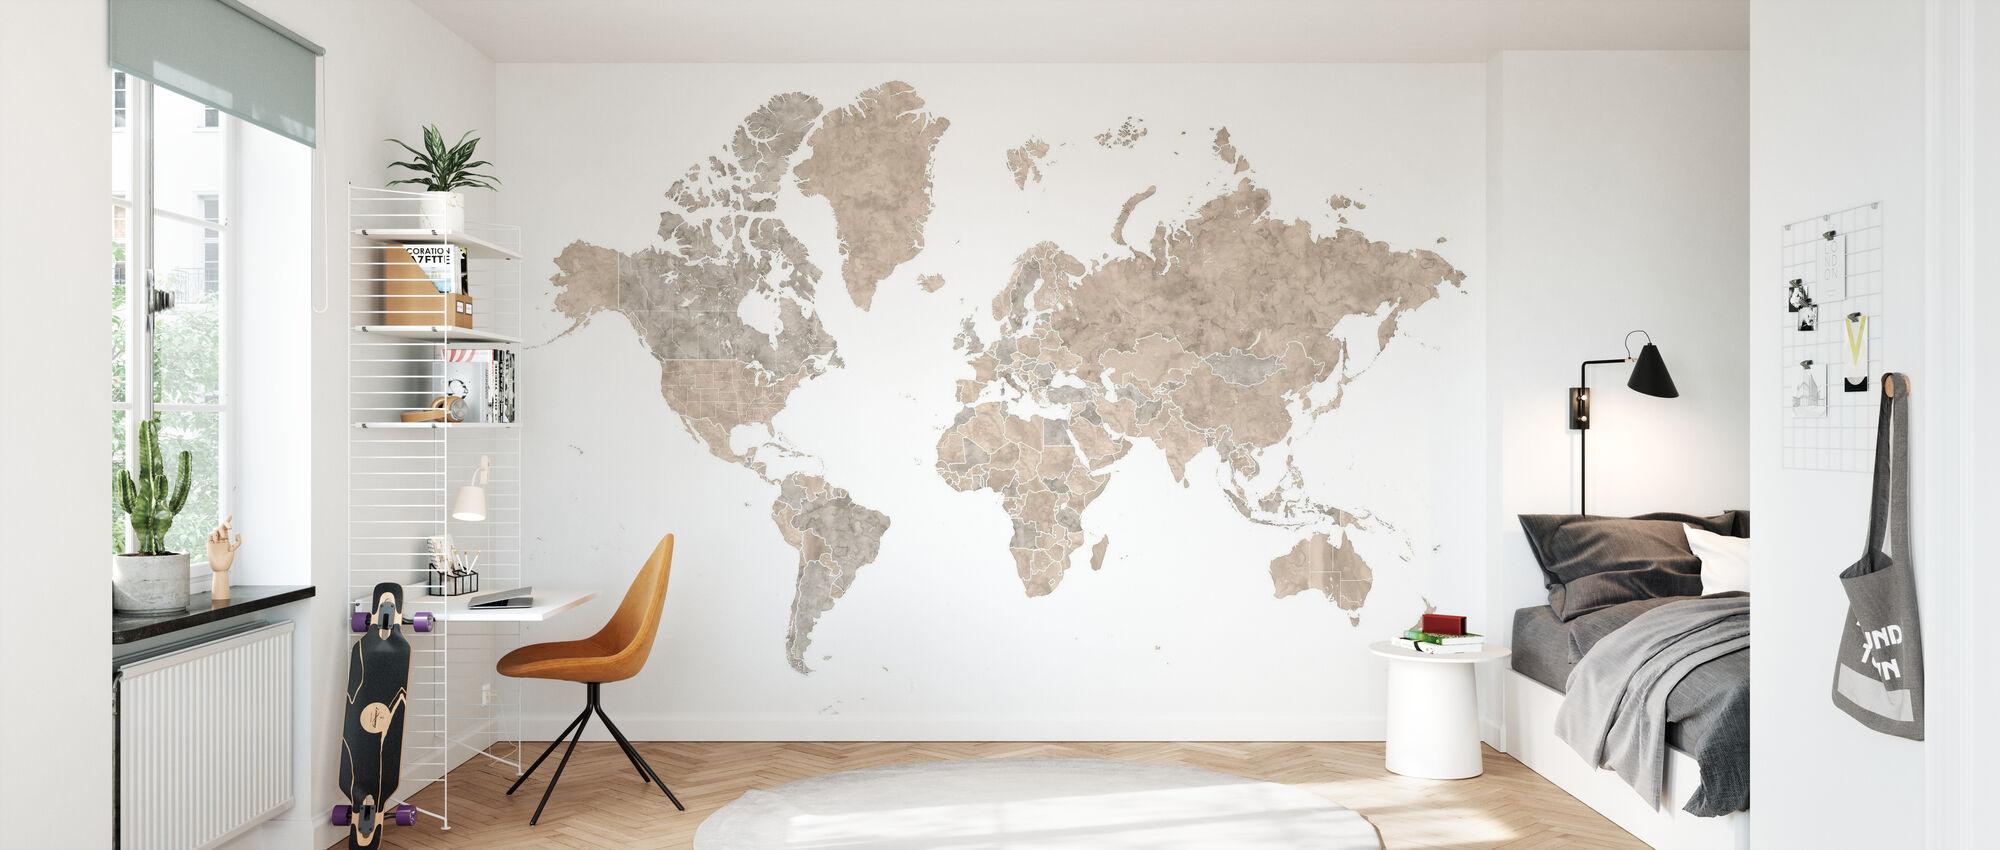 Weltkarte - Tapete - Kinderzimmer